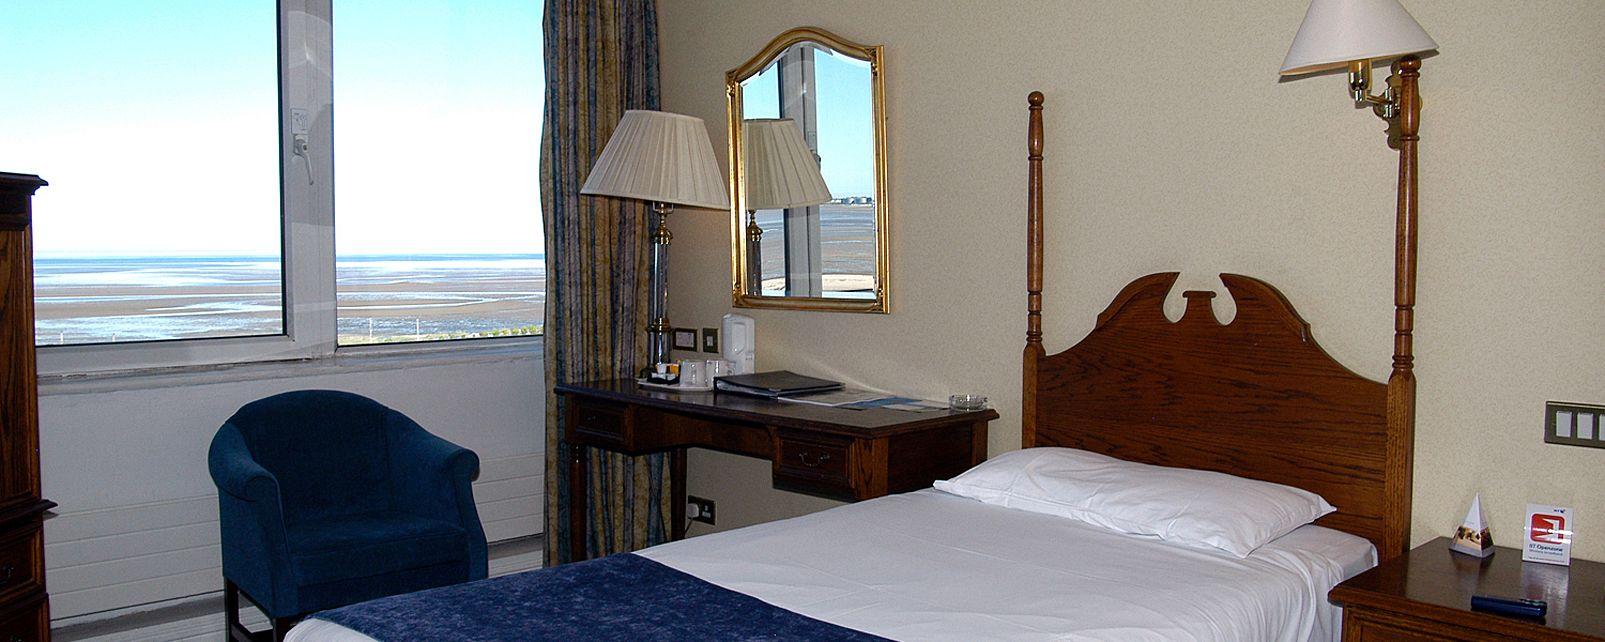 Hotel Tara Towers Hotel